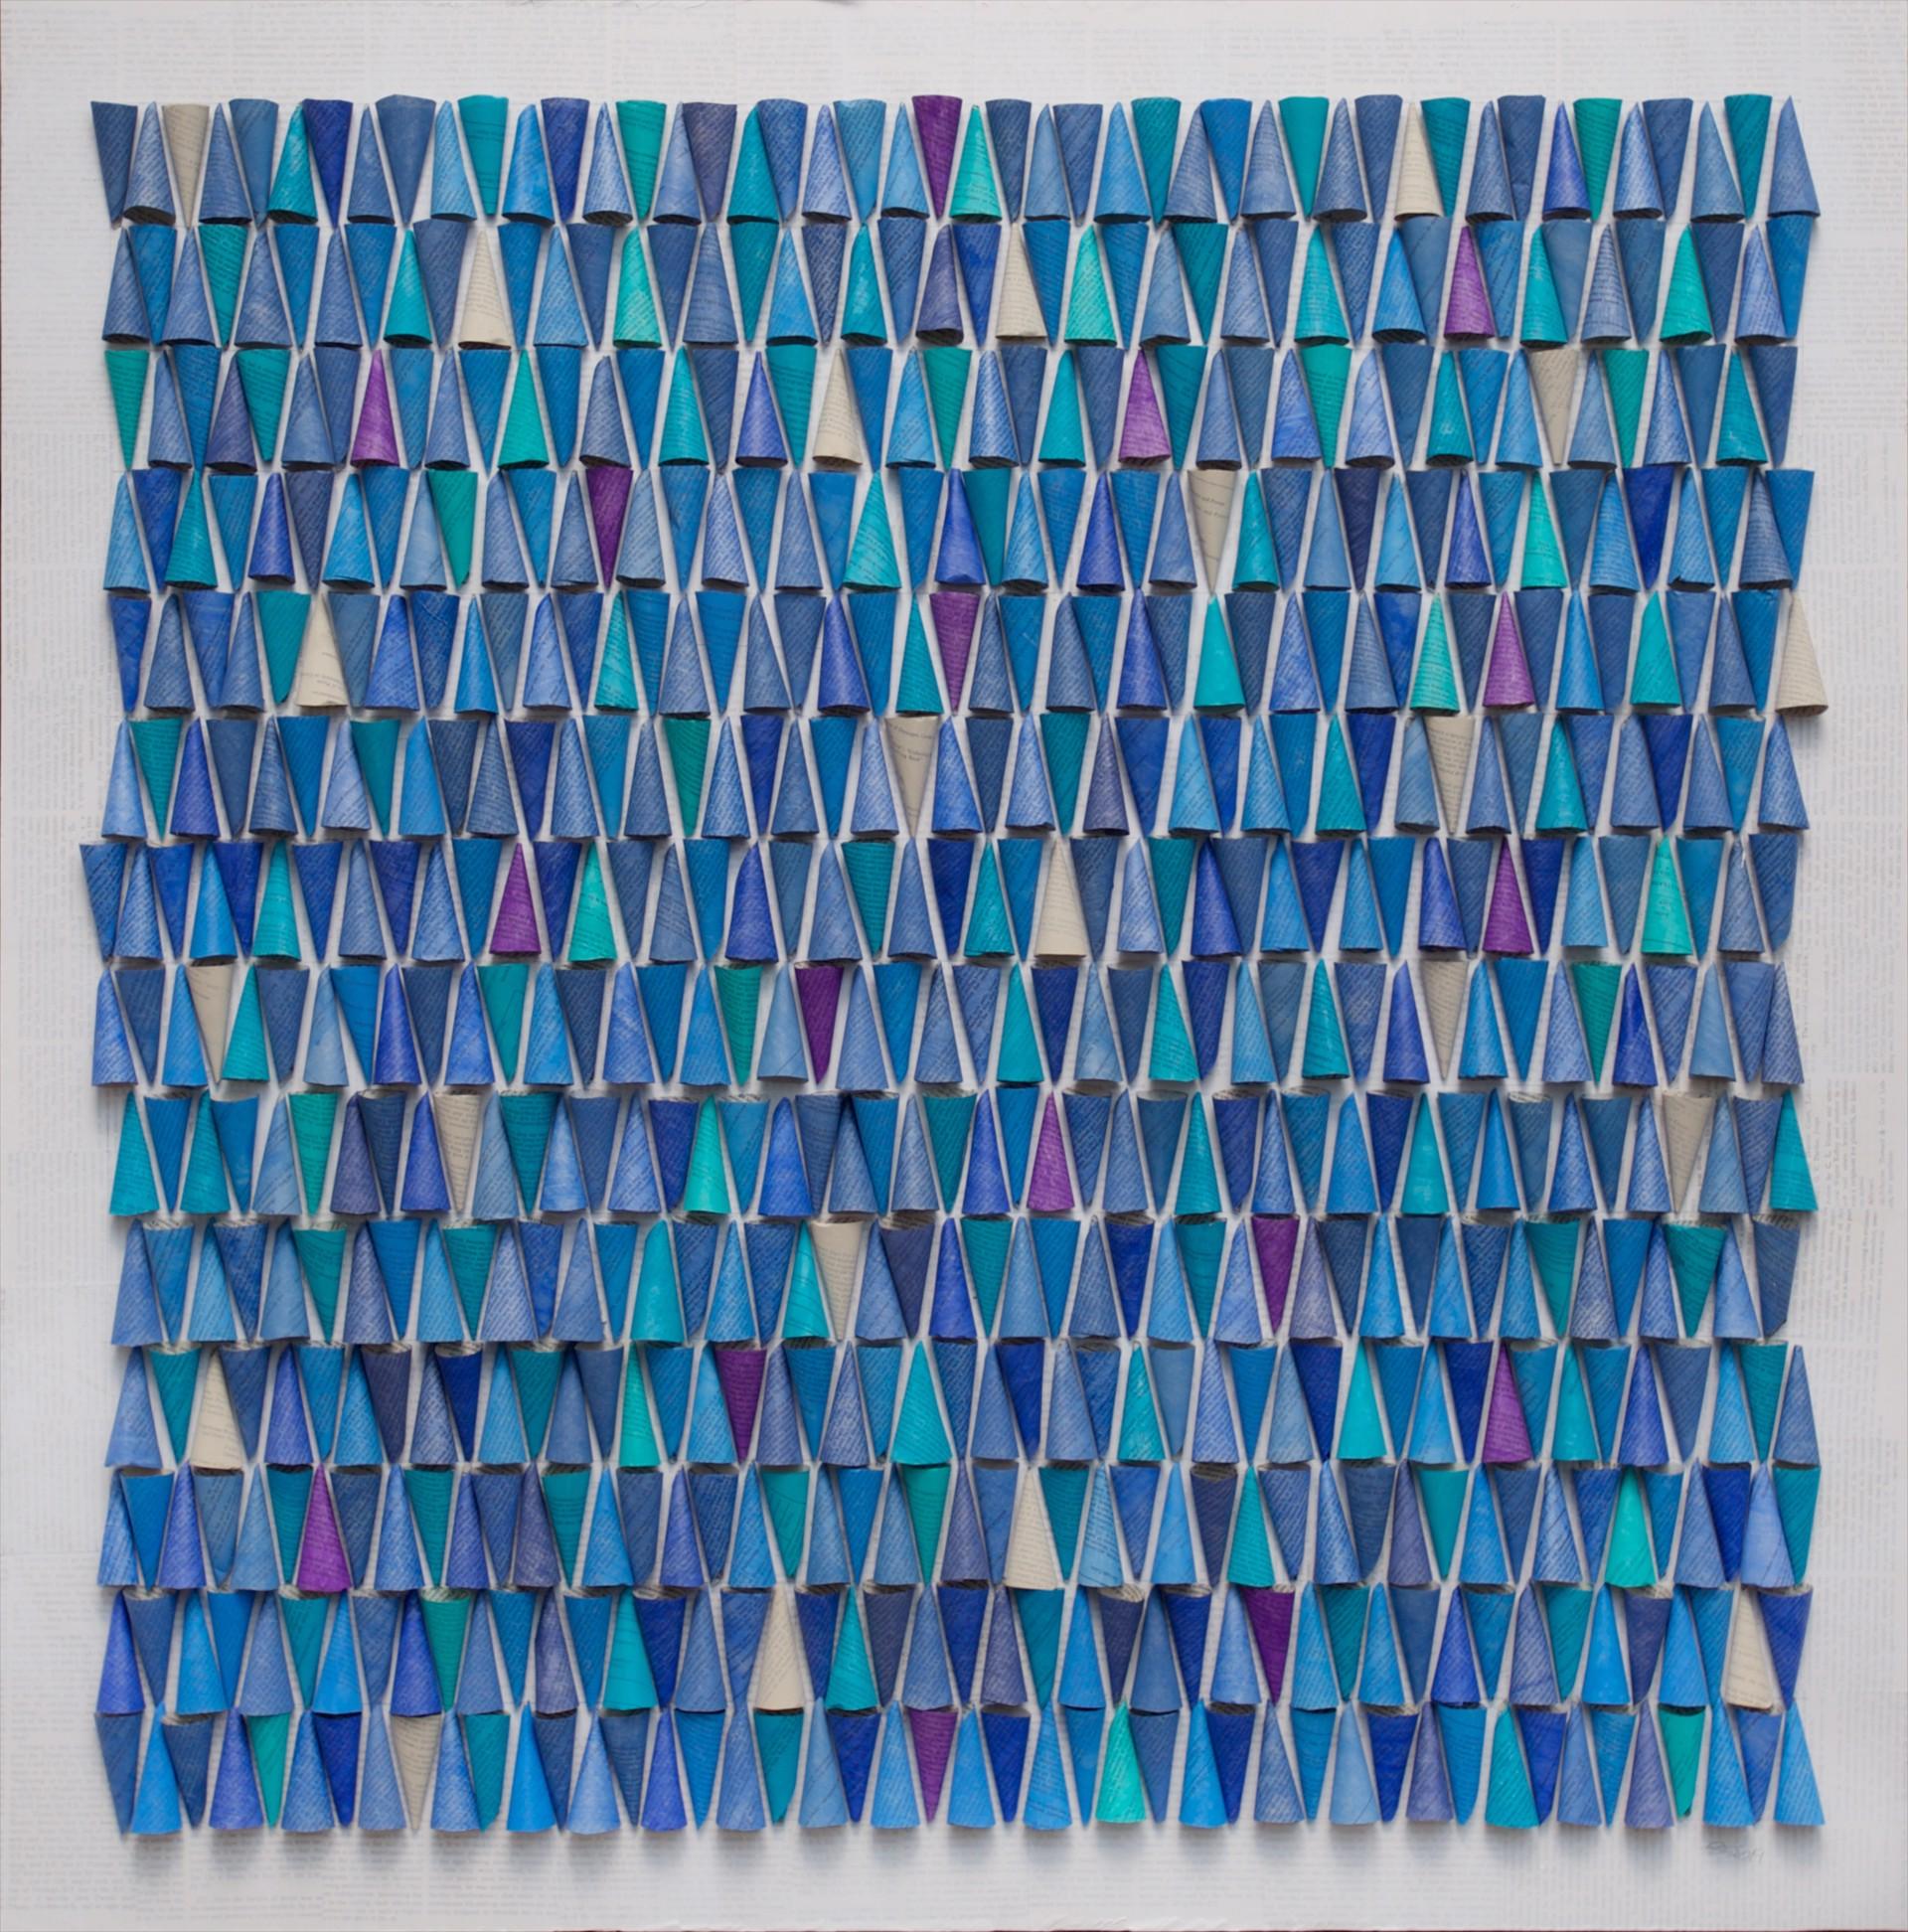 Cone Blanket by Philip Durst